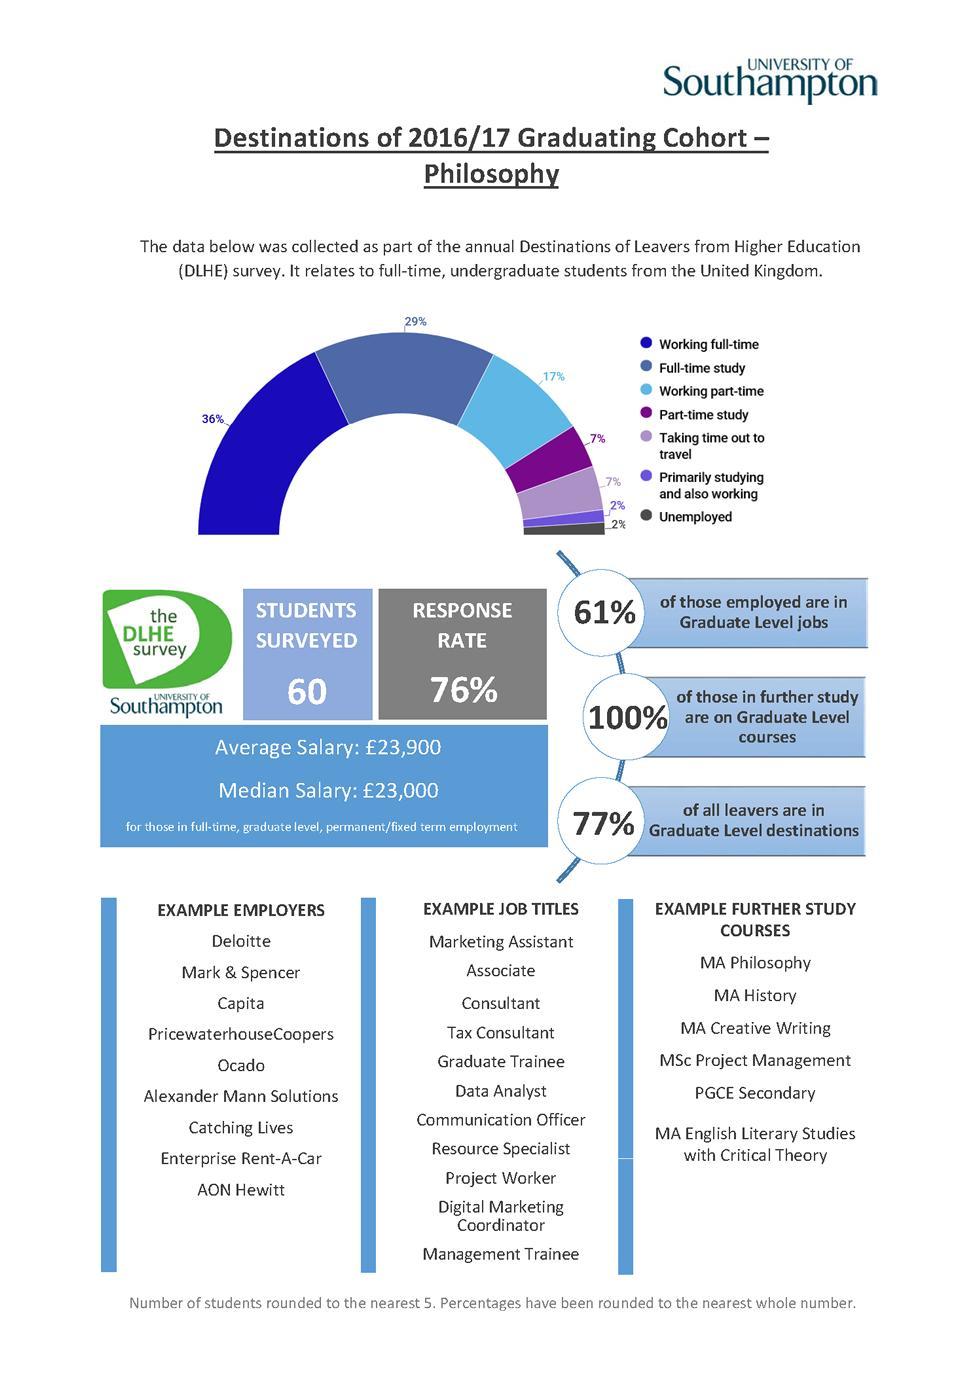 Philosophy DLHE Survey 2016-17